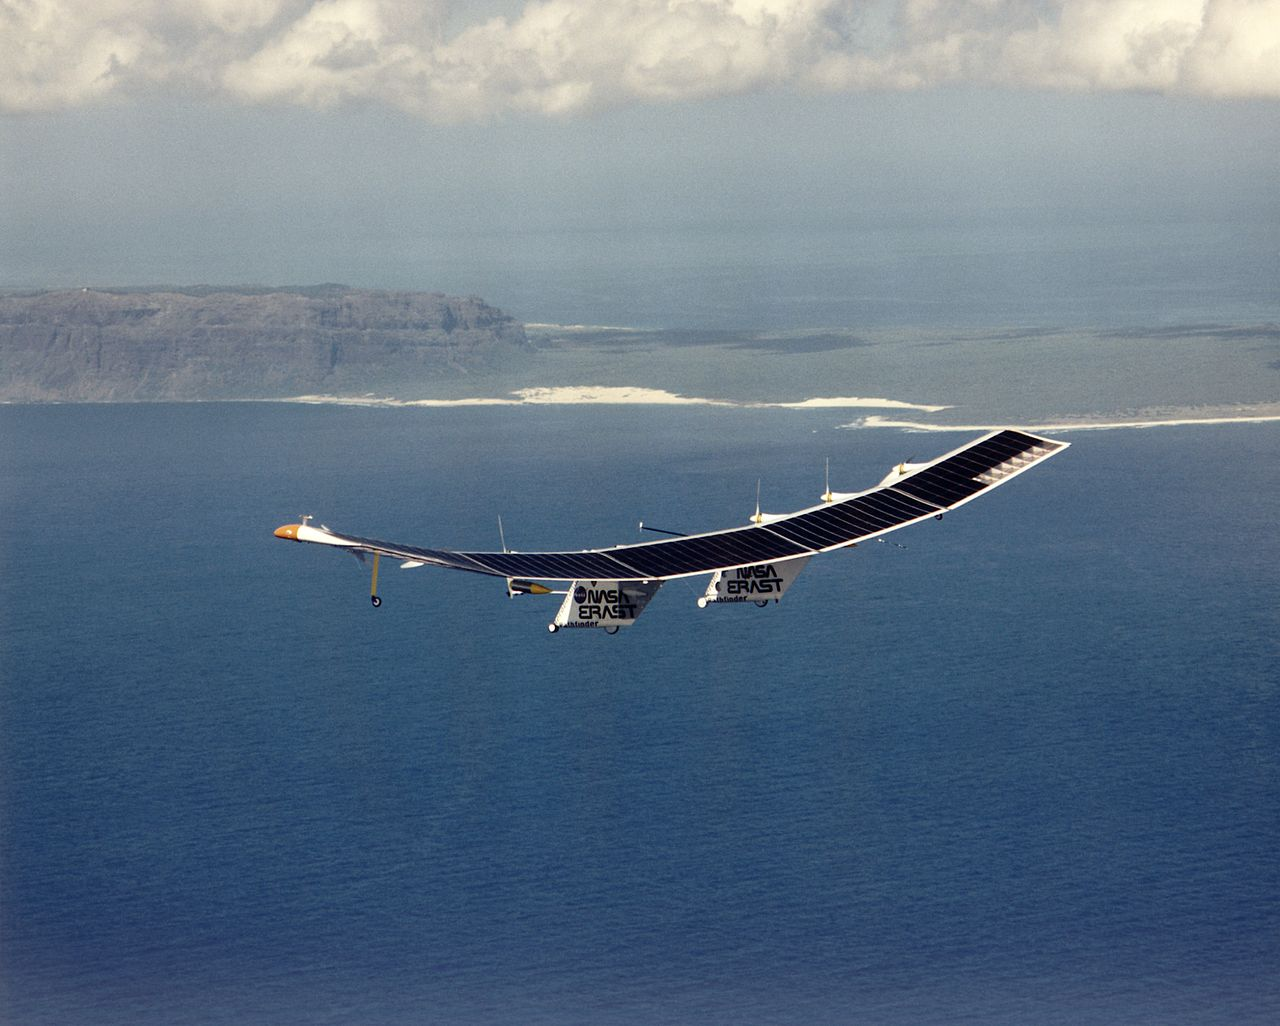 Global Focus On Solar-Powered High Altitude Long Endurance UAVs